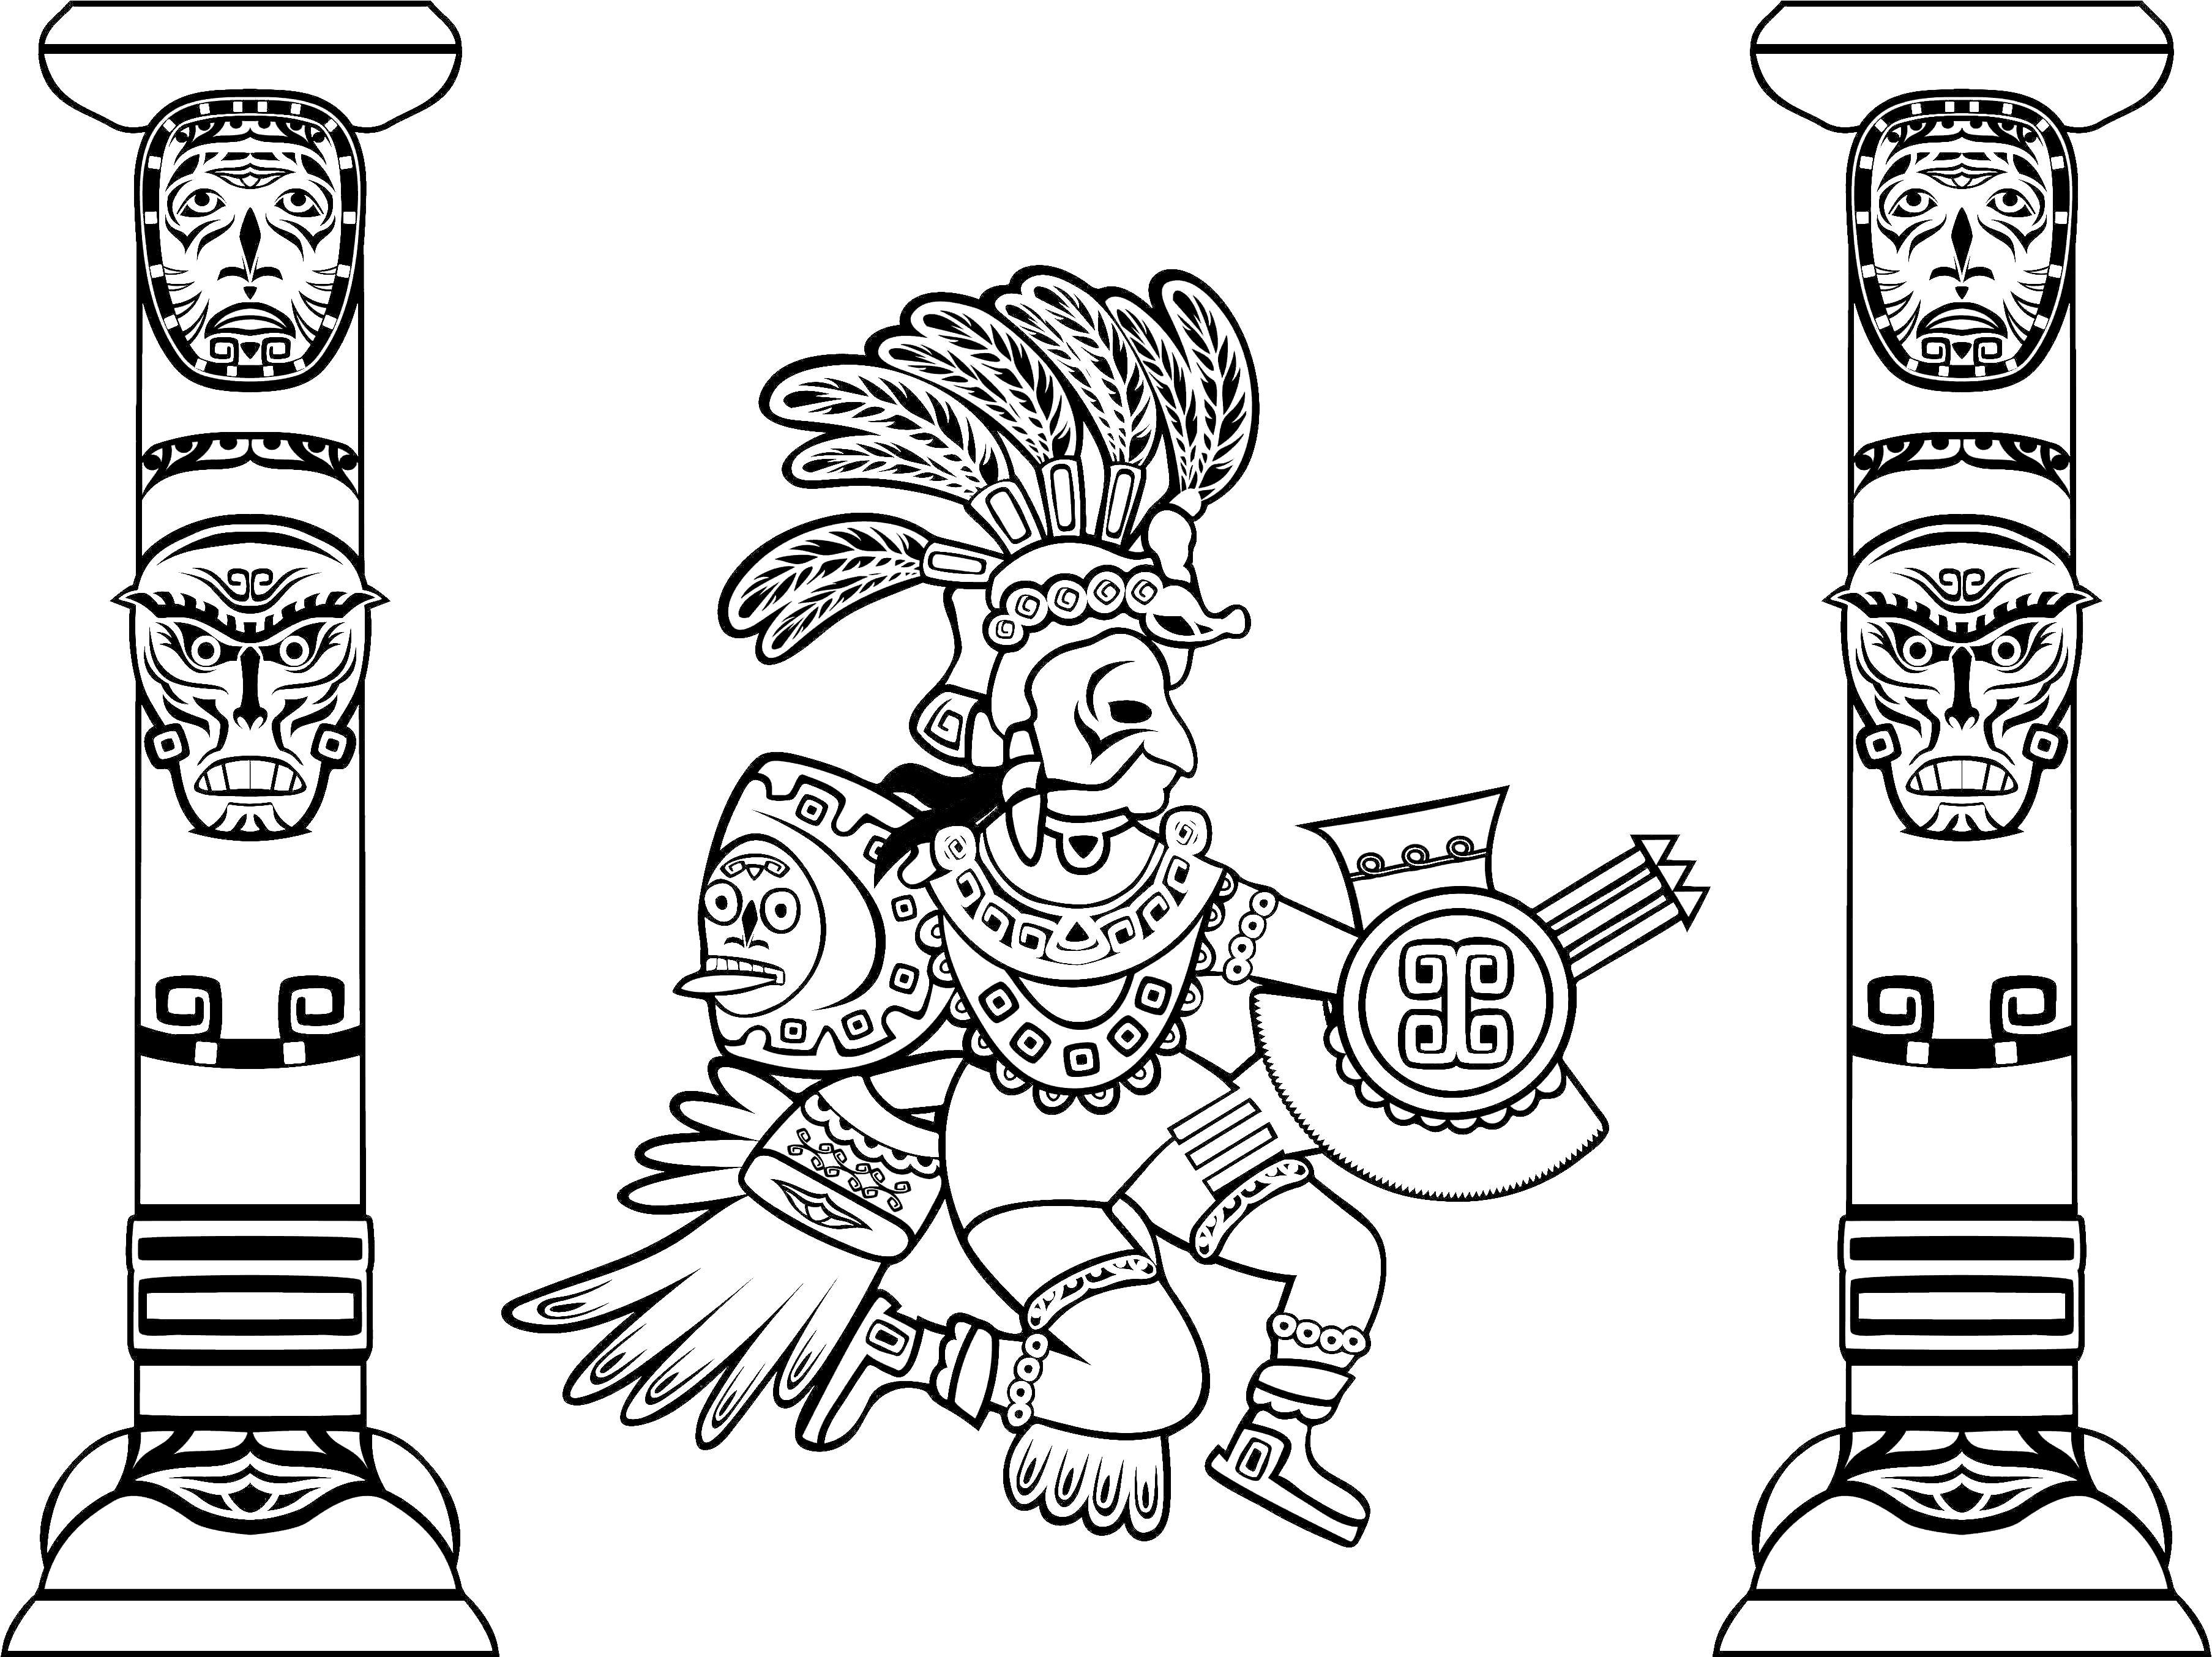 Quetzalcoatl et totems